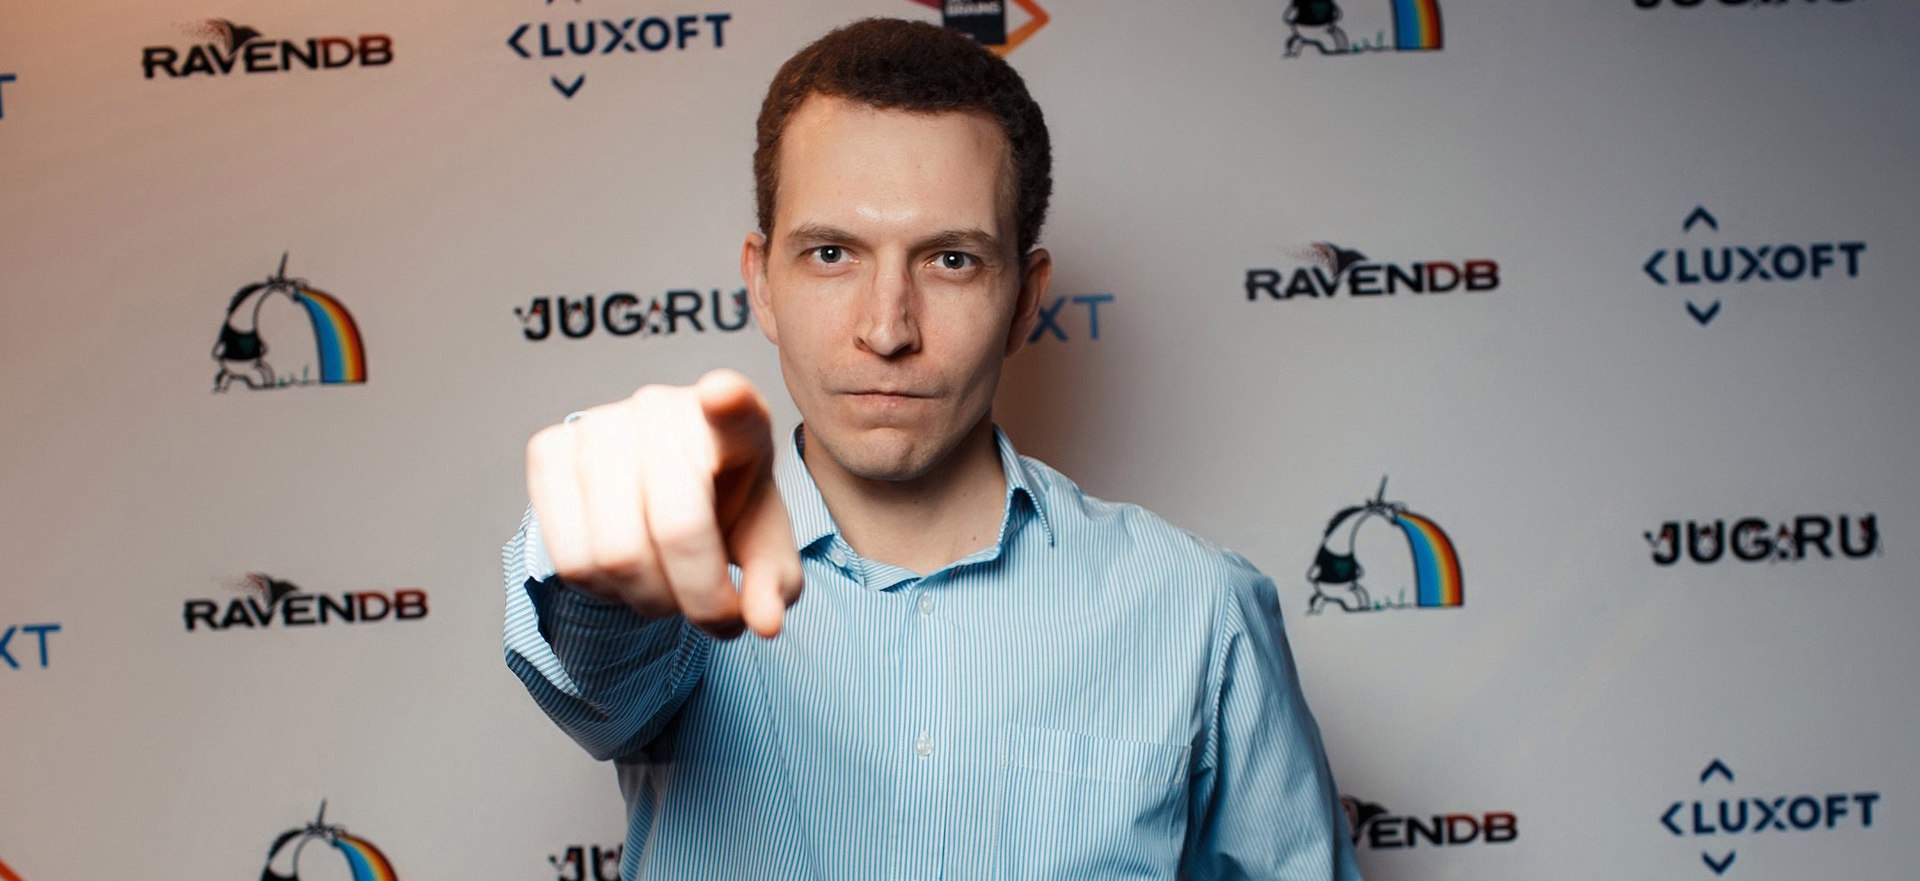 Анонс DotNext 2017 Piter: Jon Skeet в Петербурге - 4